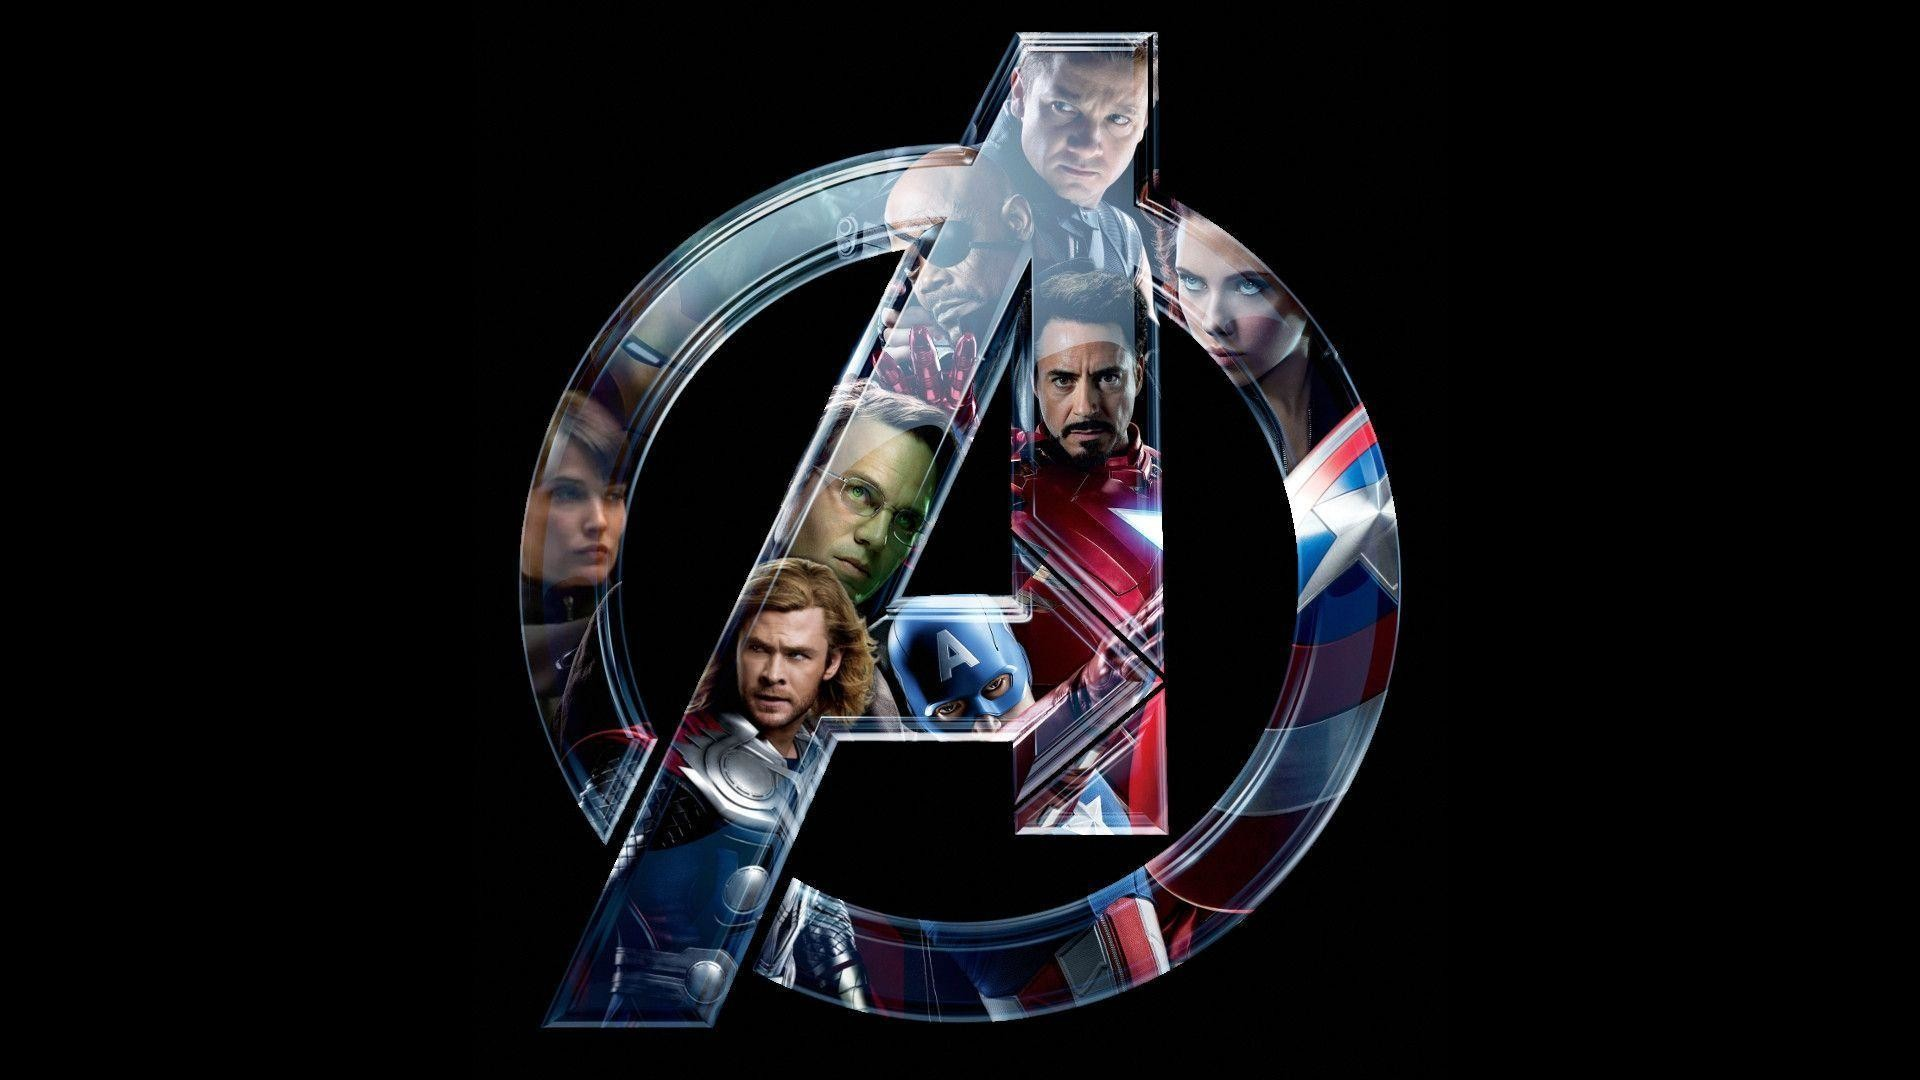 avengers logo cool hd wallpapers | Desktop Backgrounds for Free HD .